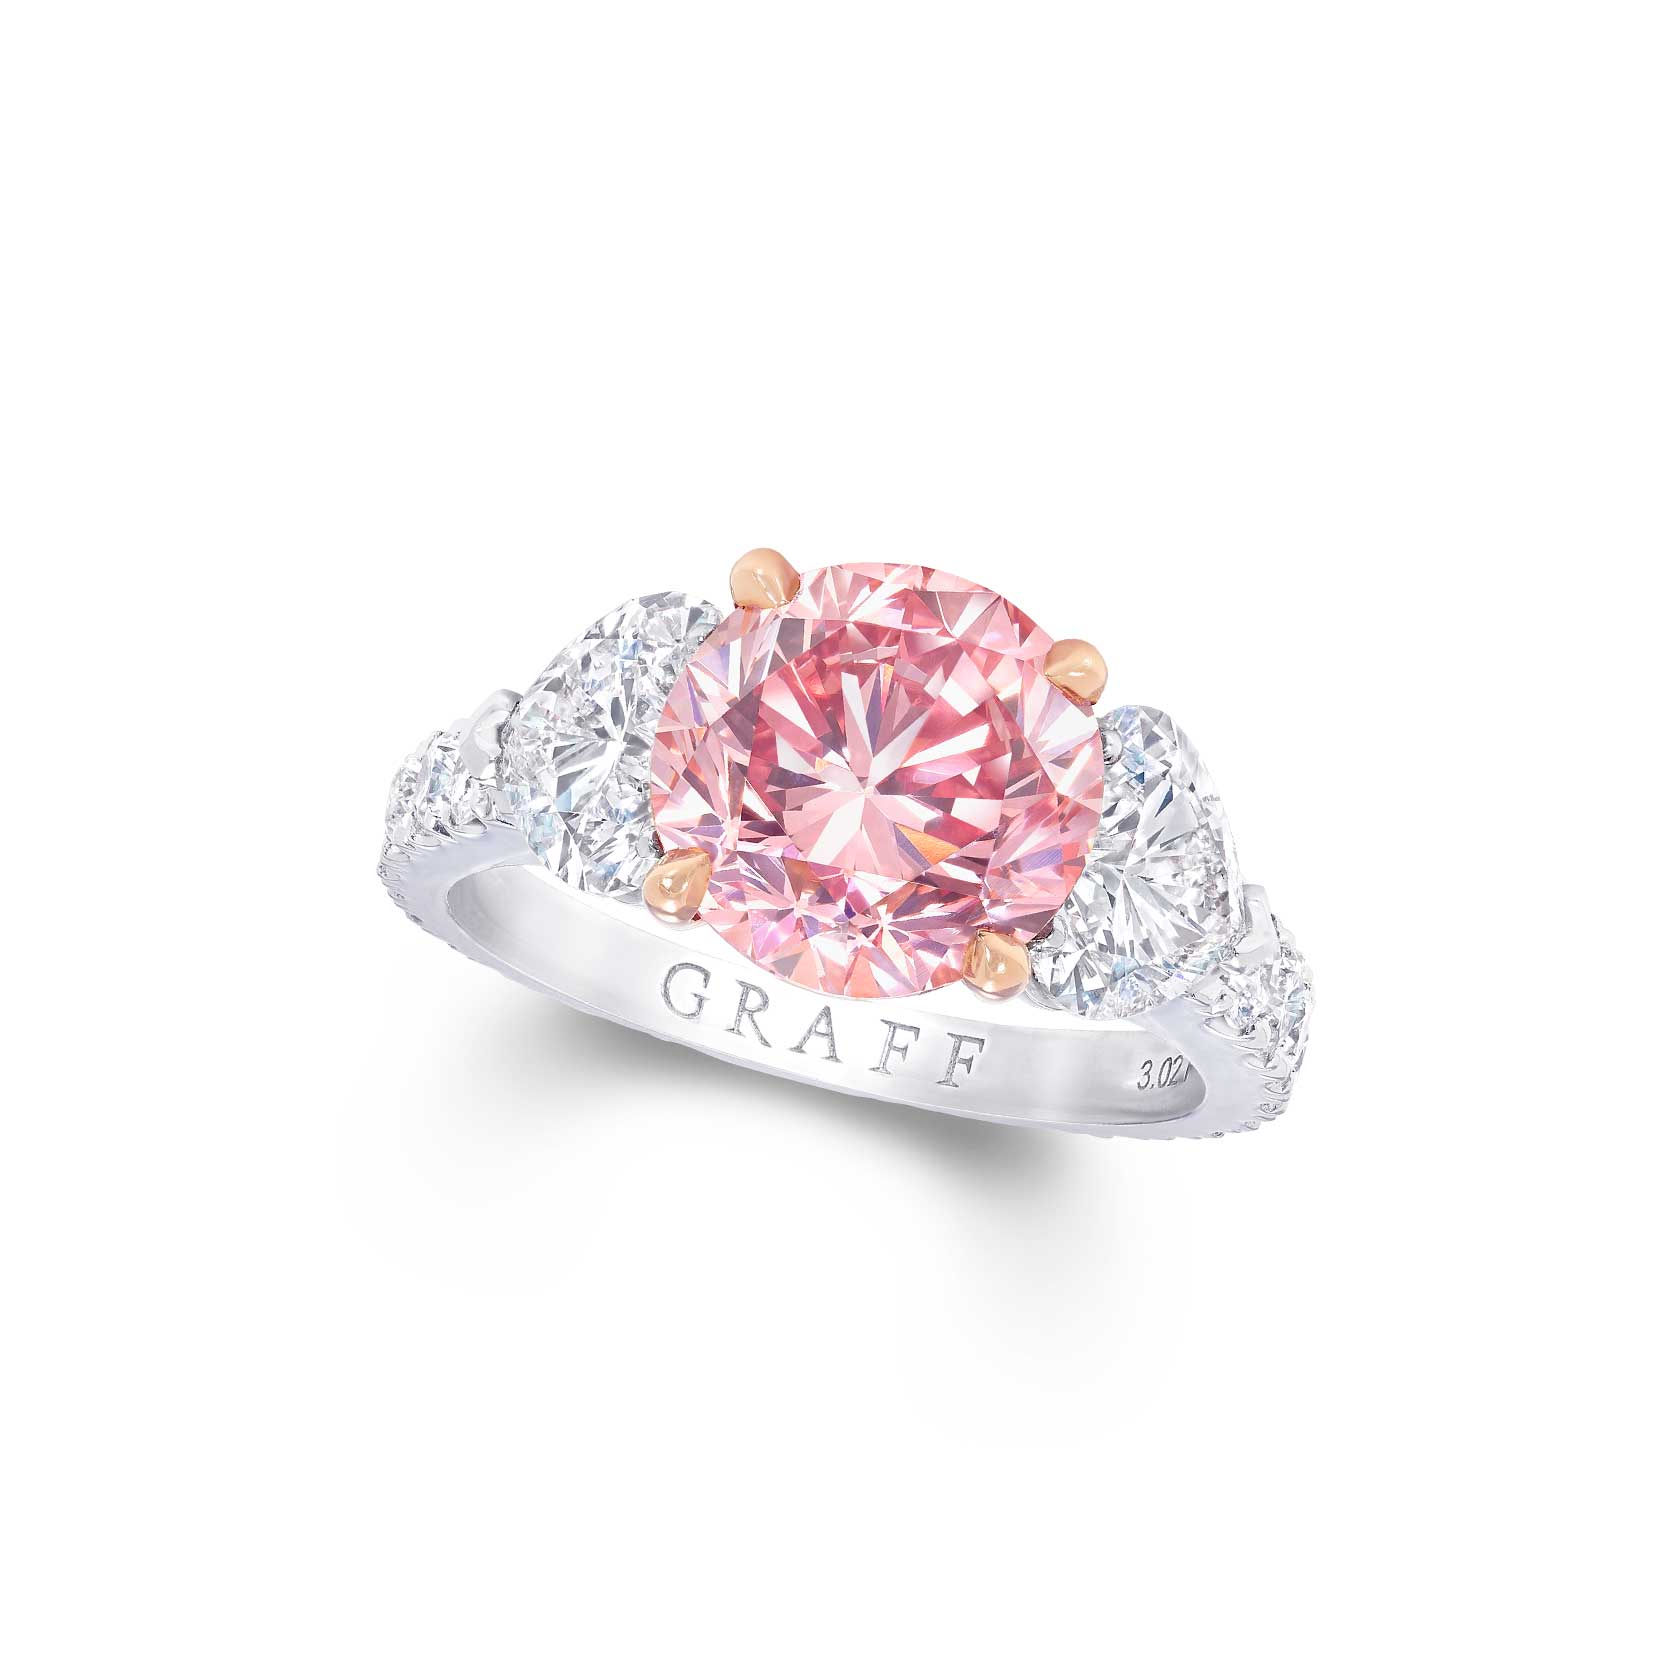 graff_fancy_vivid_purple_pink_round_diamond_ring.jpg